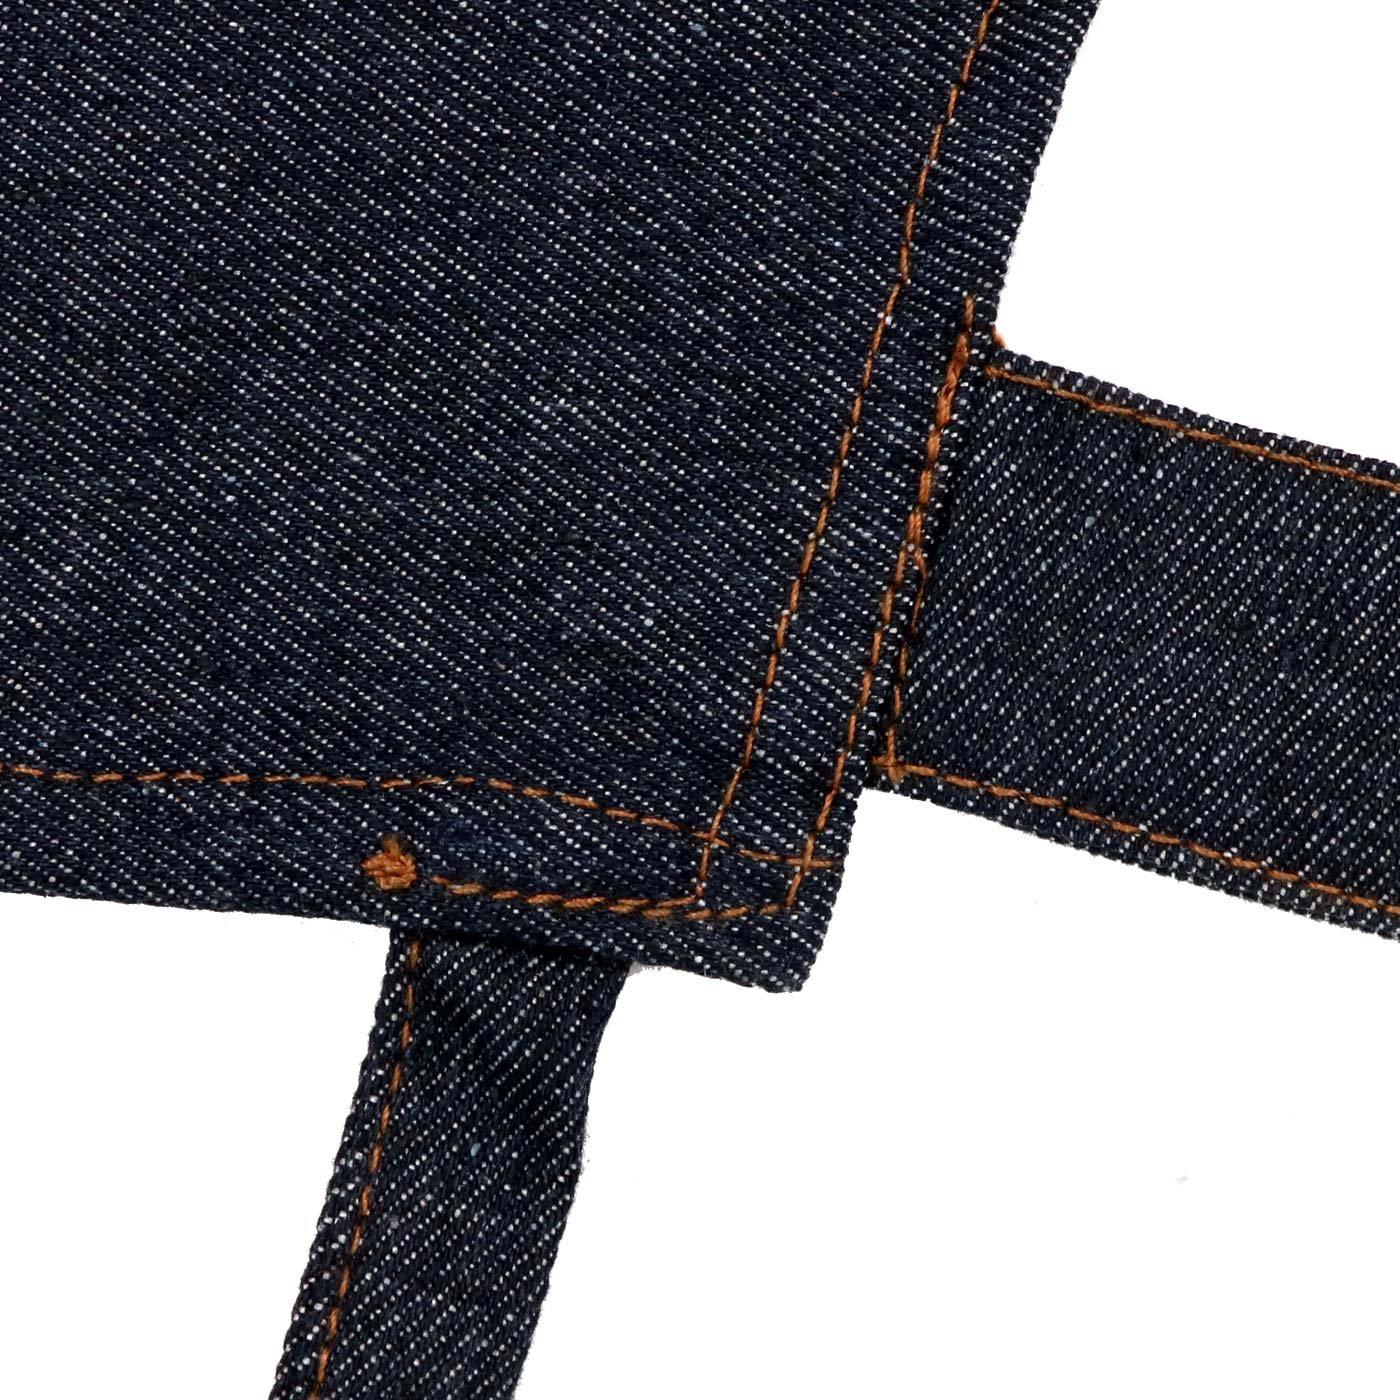 Aivtalk Cotton Denim Work Apron with Pockets Double Shoulder Straps Adjustable up to XXL for Men Women Craftsmen Blue